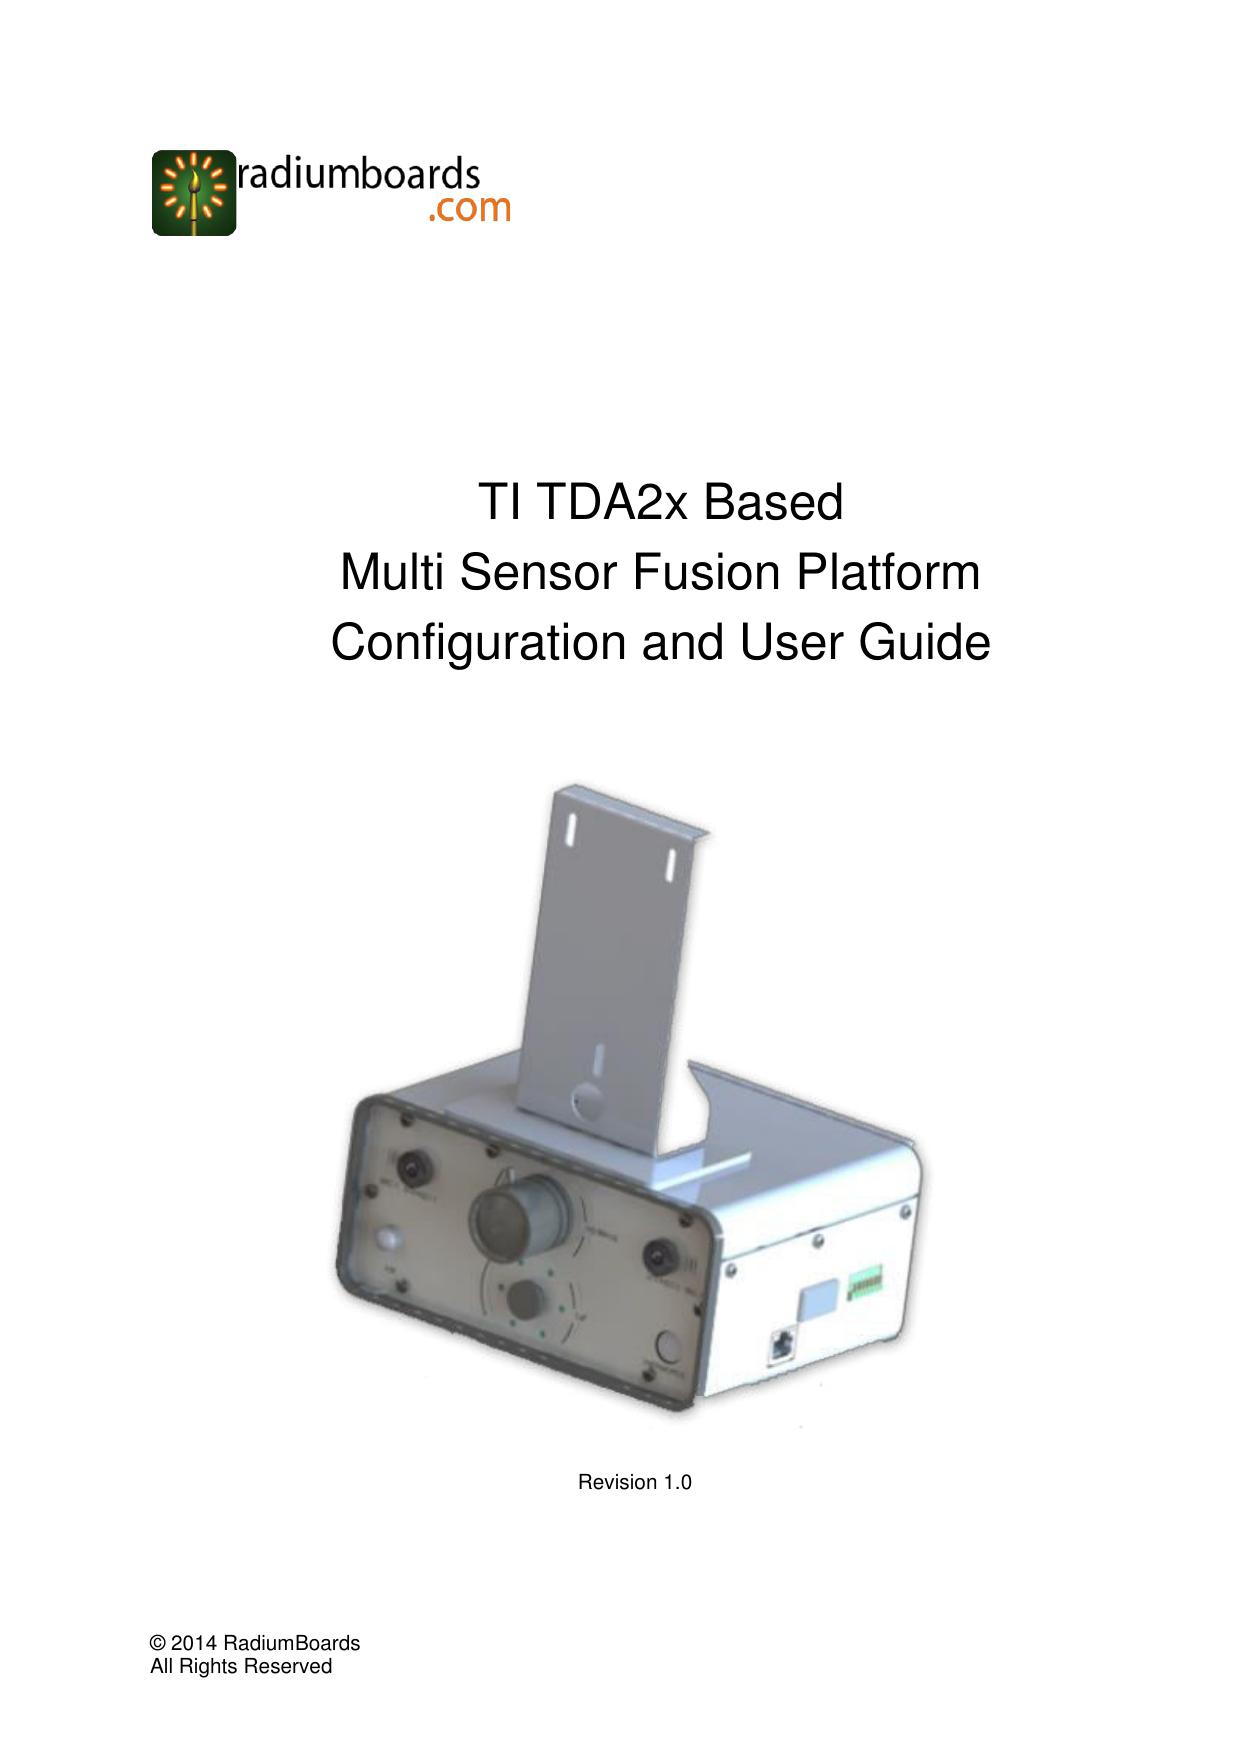 TI TDA2x Based Multi Sensor Fusion Platform Configuration